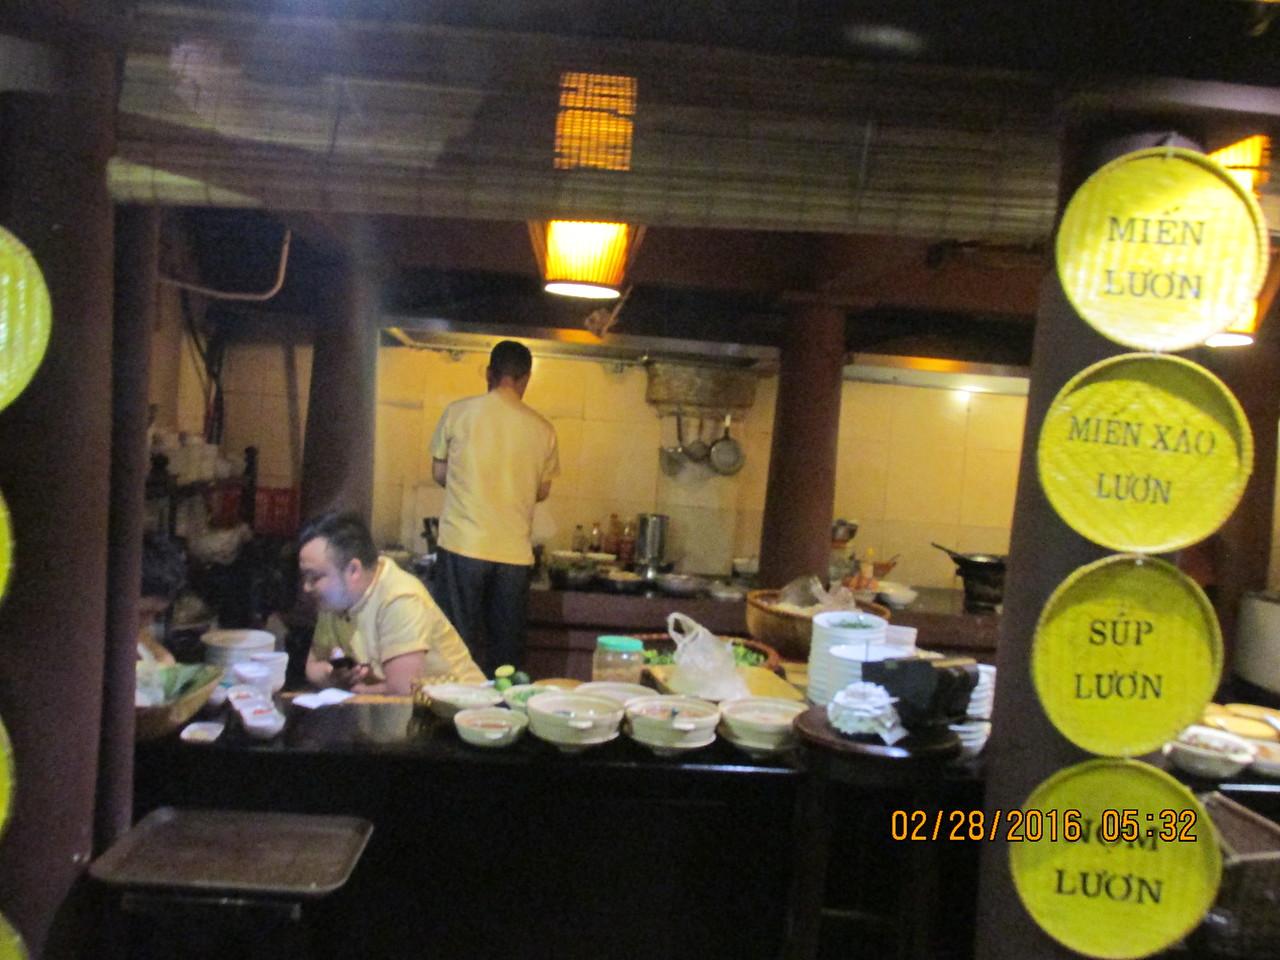 0068 - Quan An Ngon Restaurant on Phan Boi Chau - Hanoi Vietnam - Date Correct but Time on Pic is Wrong